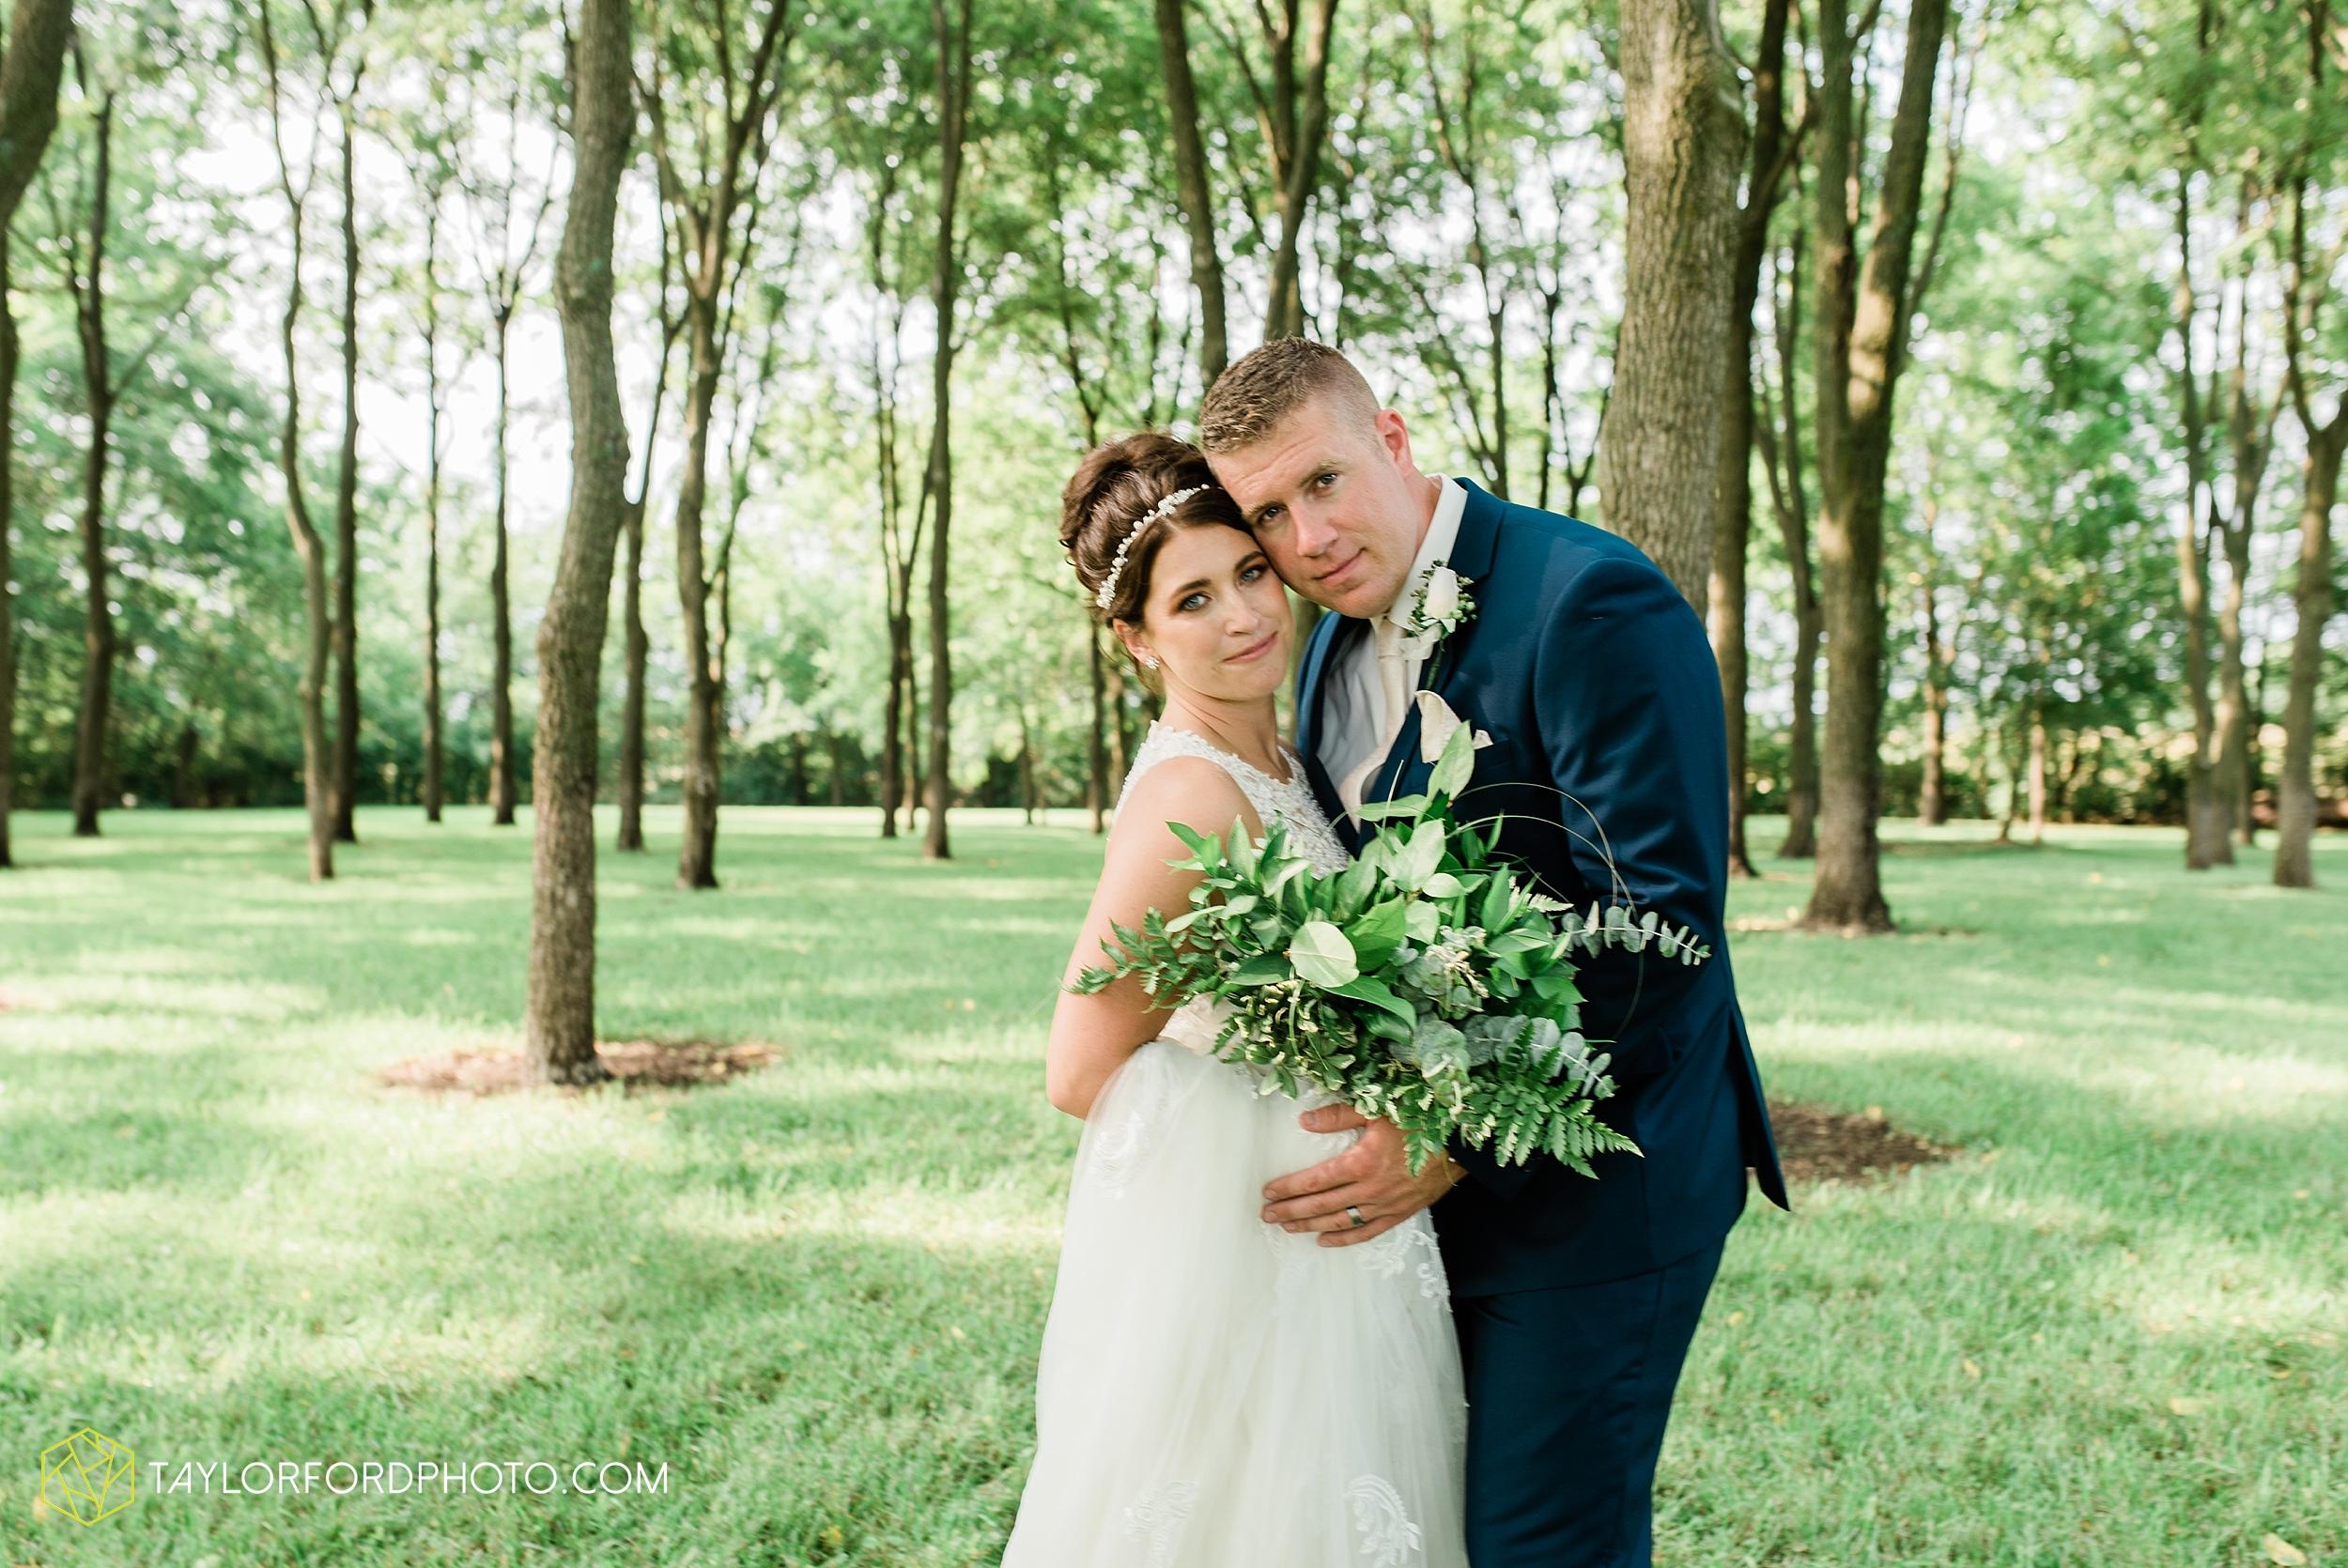 van-wert-ohio-first-united-methodist-church-county-dairy-barn-wedding-photographer-taylor-ford-photography_9854.jpg